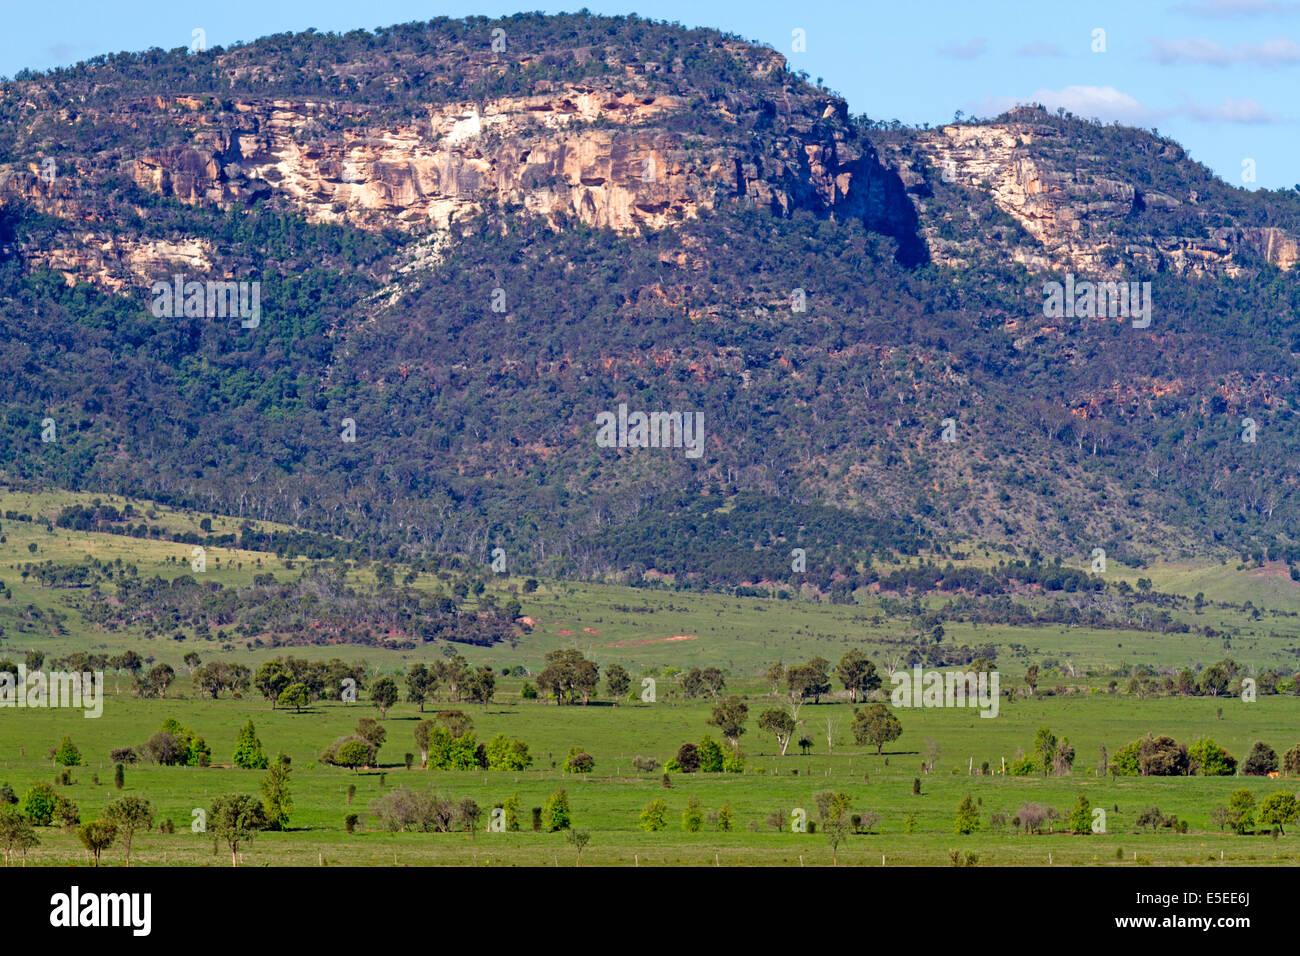 The Blackdown Tableland escarpment - Stock Image